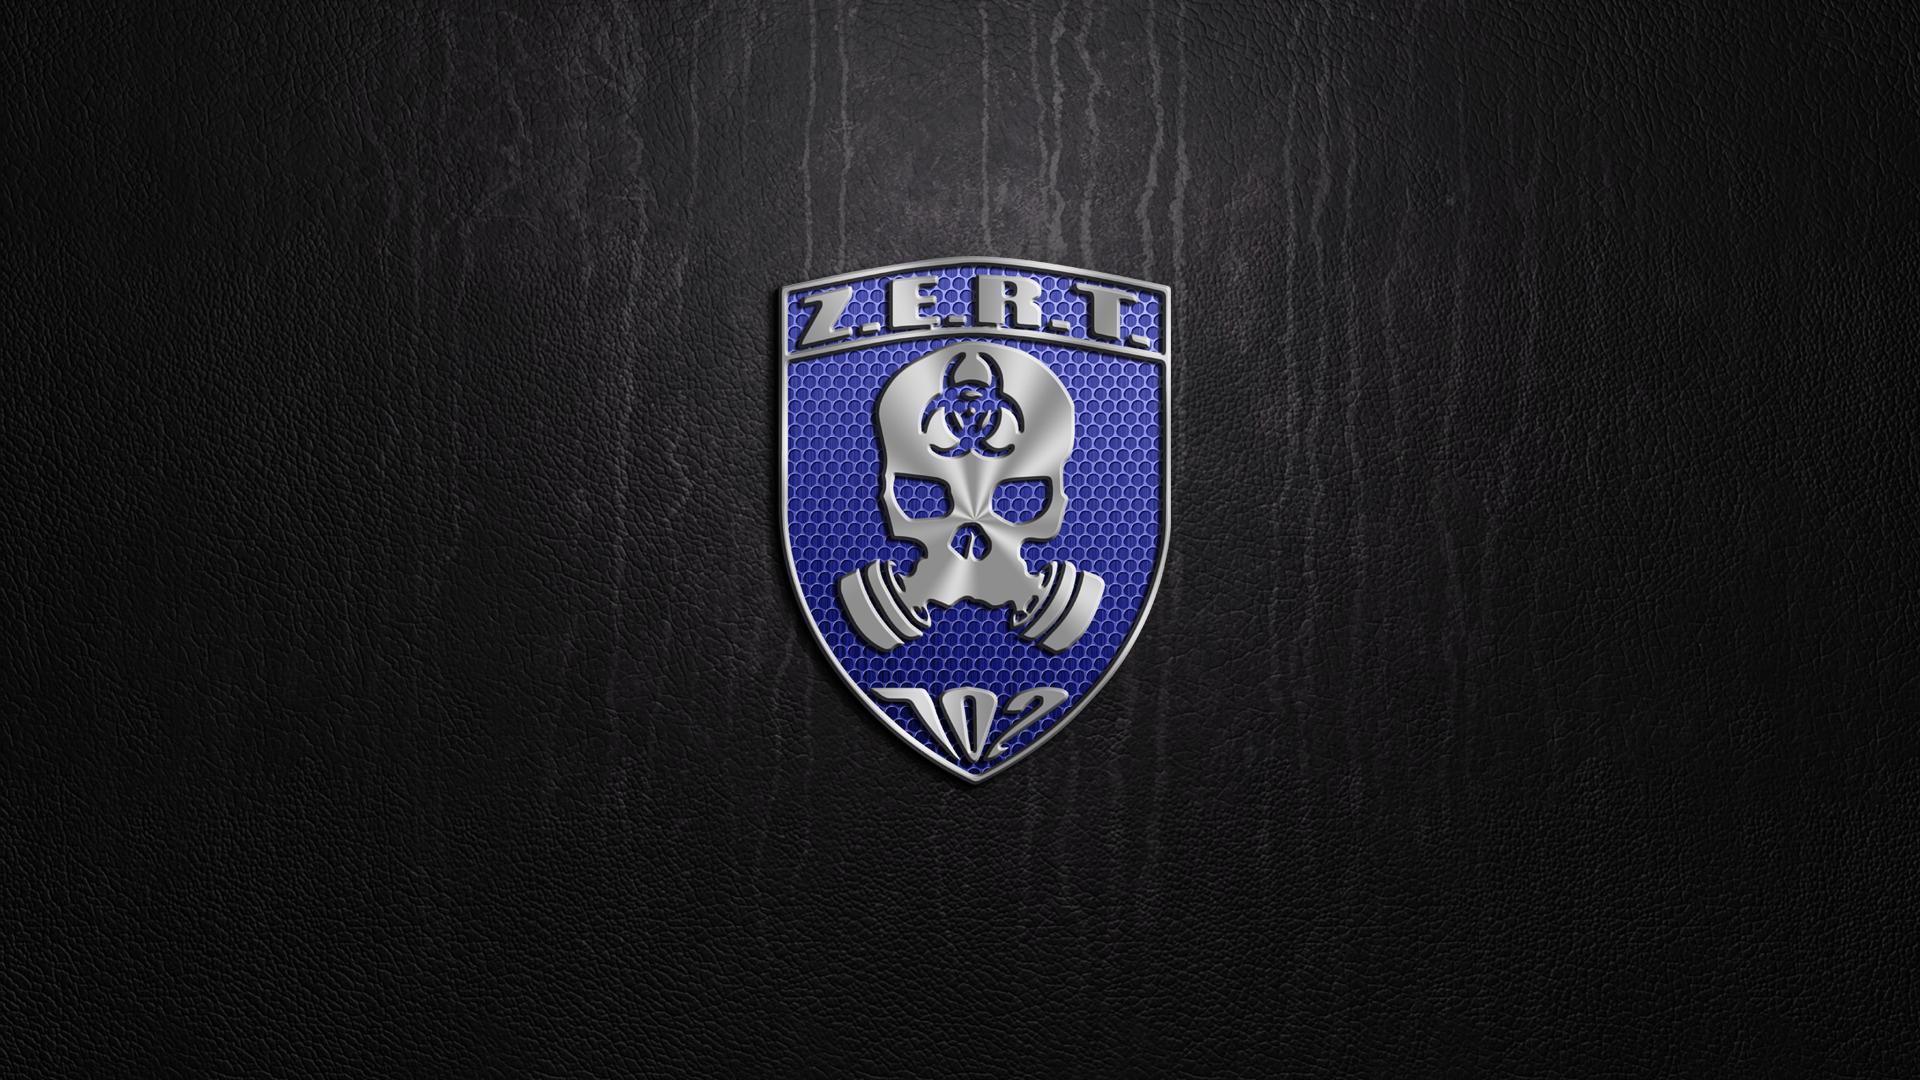 ZERT HD Wallpaper Background Image 1920x1080 ID588086 1920x1080